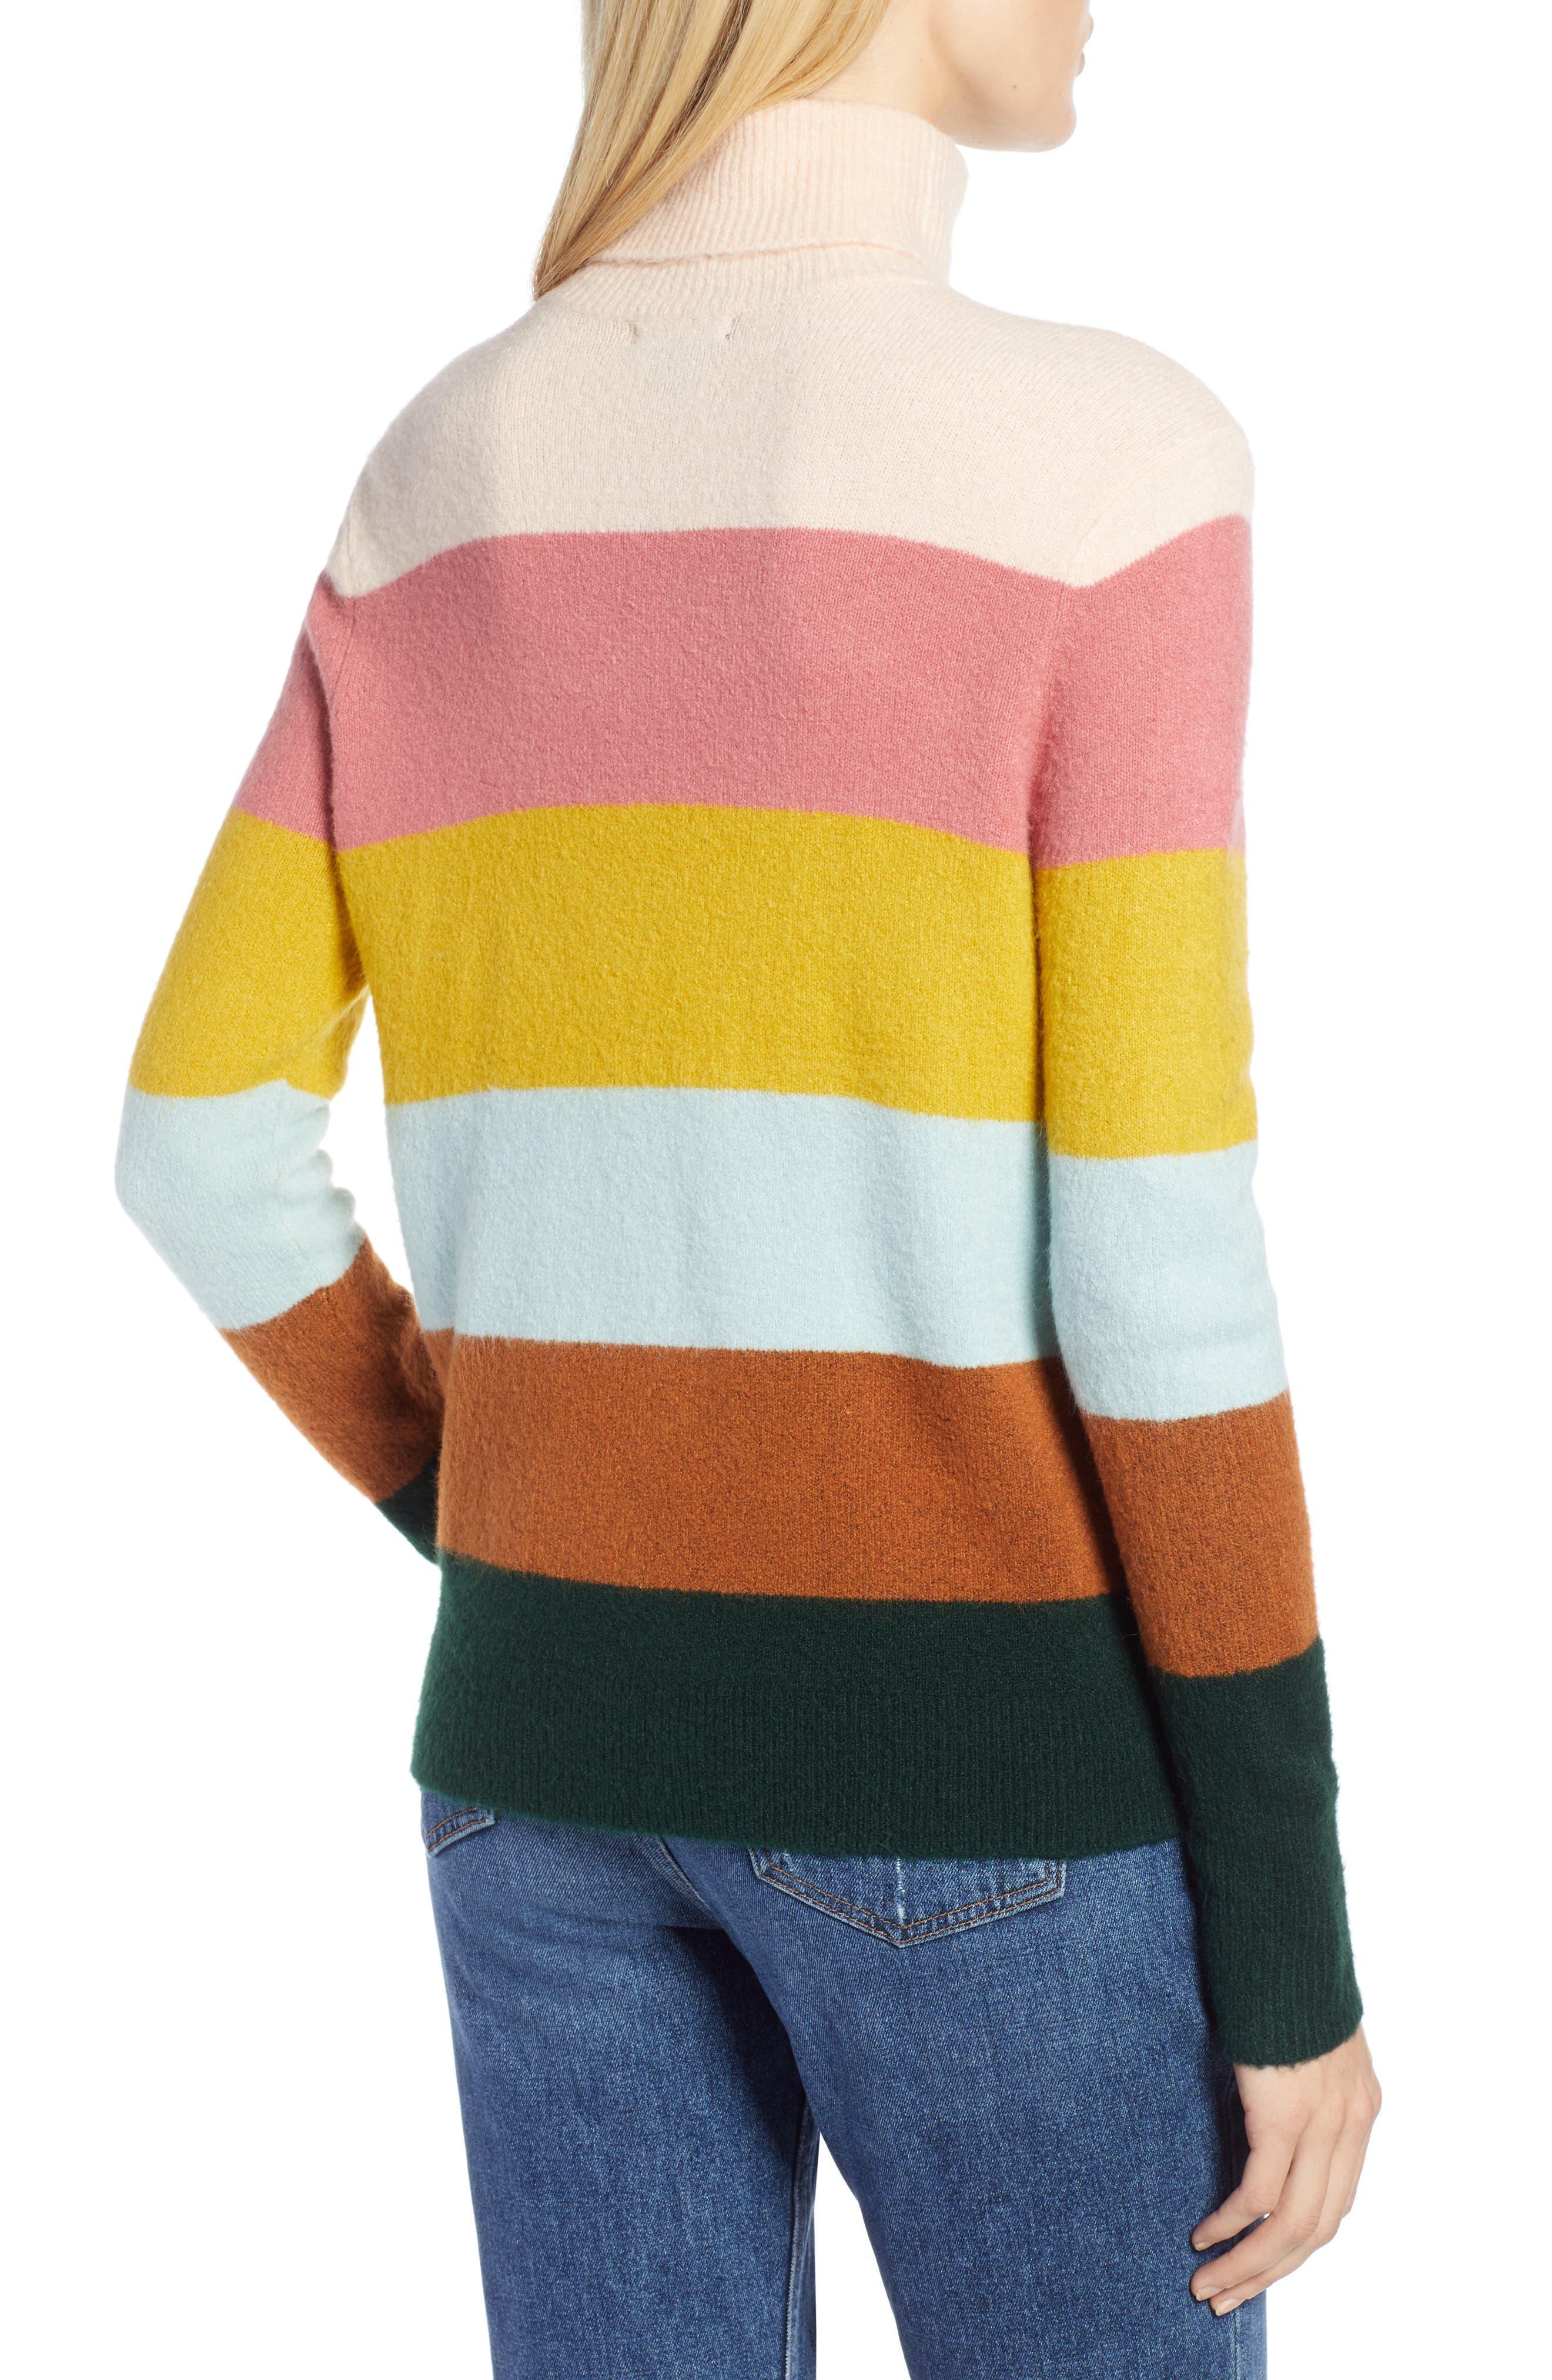 x Atlantic-Pacific Stripe Turtleneck Sweater,                             Alternate thumbnail 3, color,                             PINK MULTI STRIPE